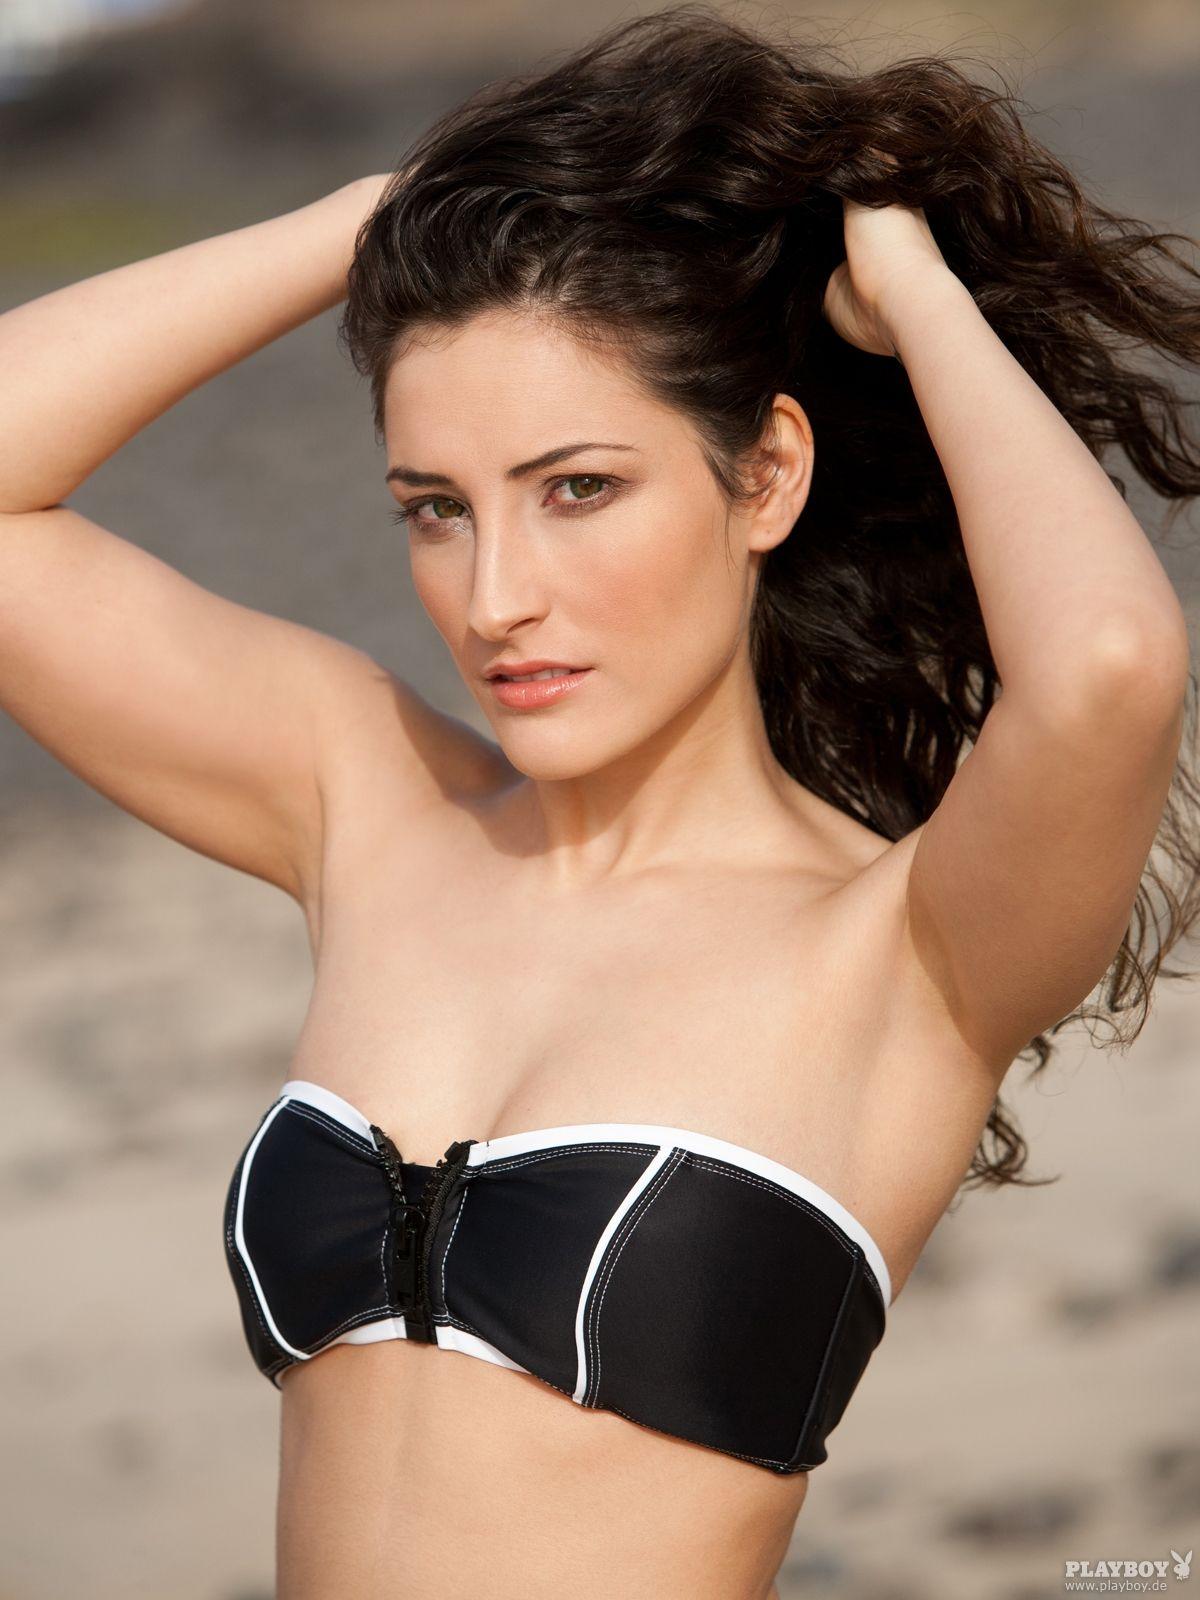 Playboy: Hot women from Turkey Aylin Alp of Germany | The